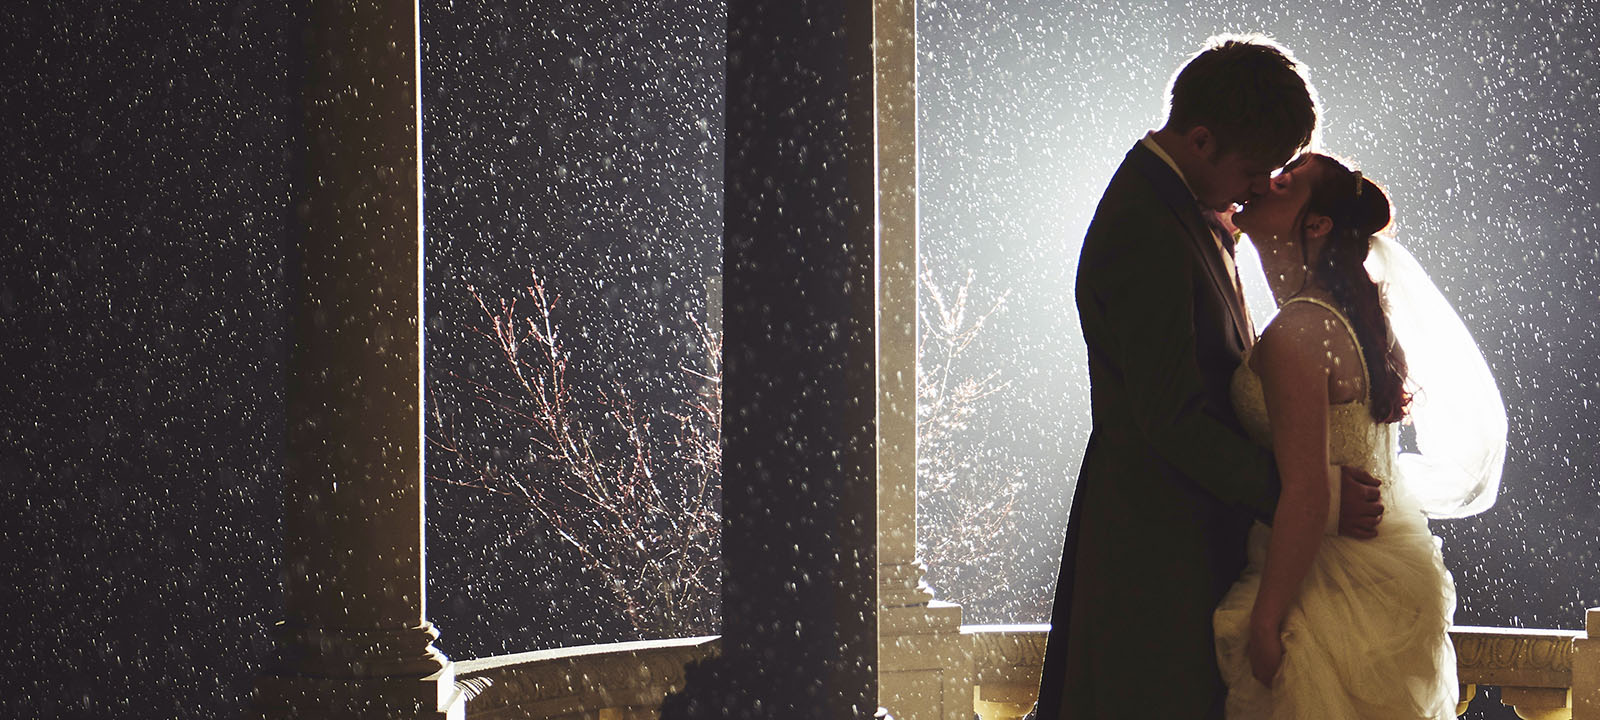 Winter Wedding in the Snow, Sleet & Rain at Ringwood Hall Hotel, Chesterfield - Wedding Photographer